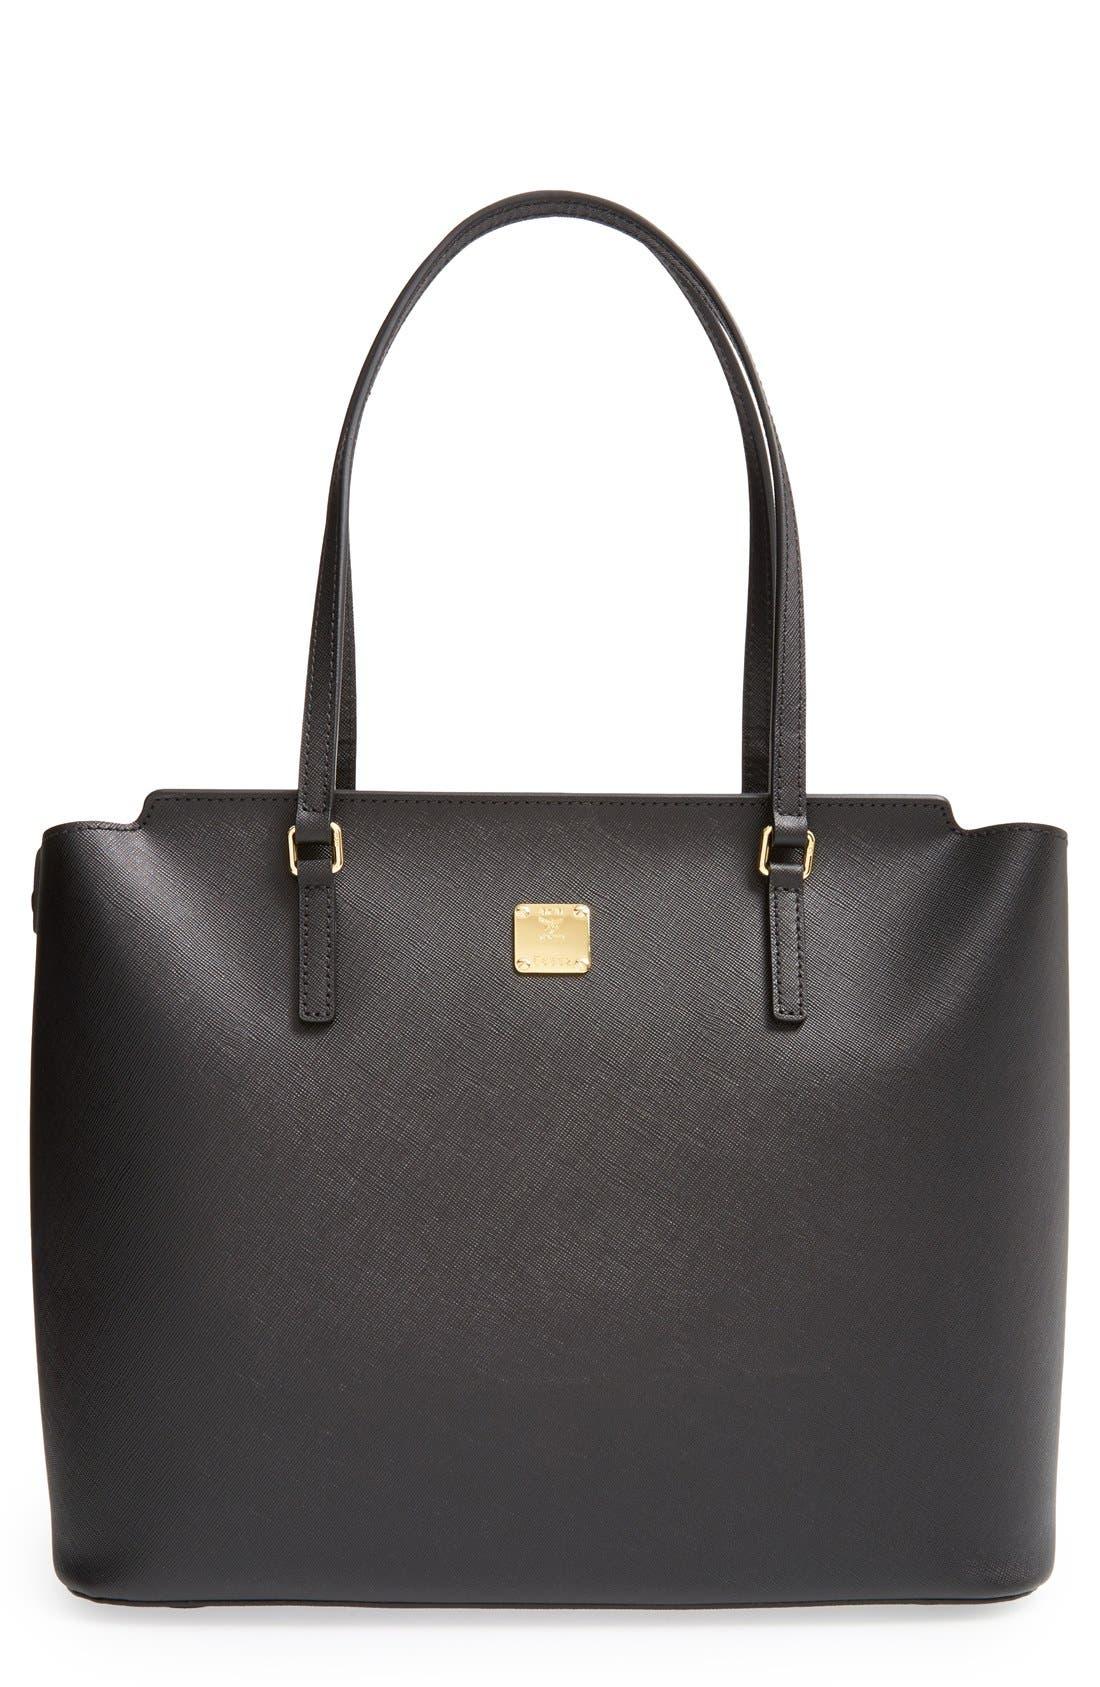 Main Image - MCM 'Medium Project' Saffiano Leather Shopper